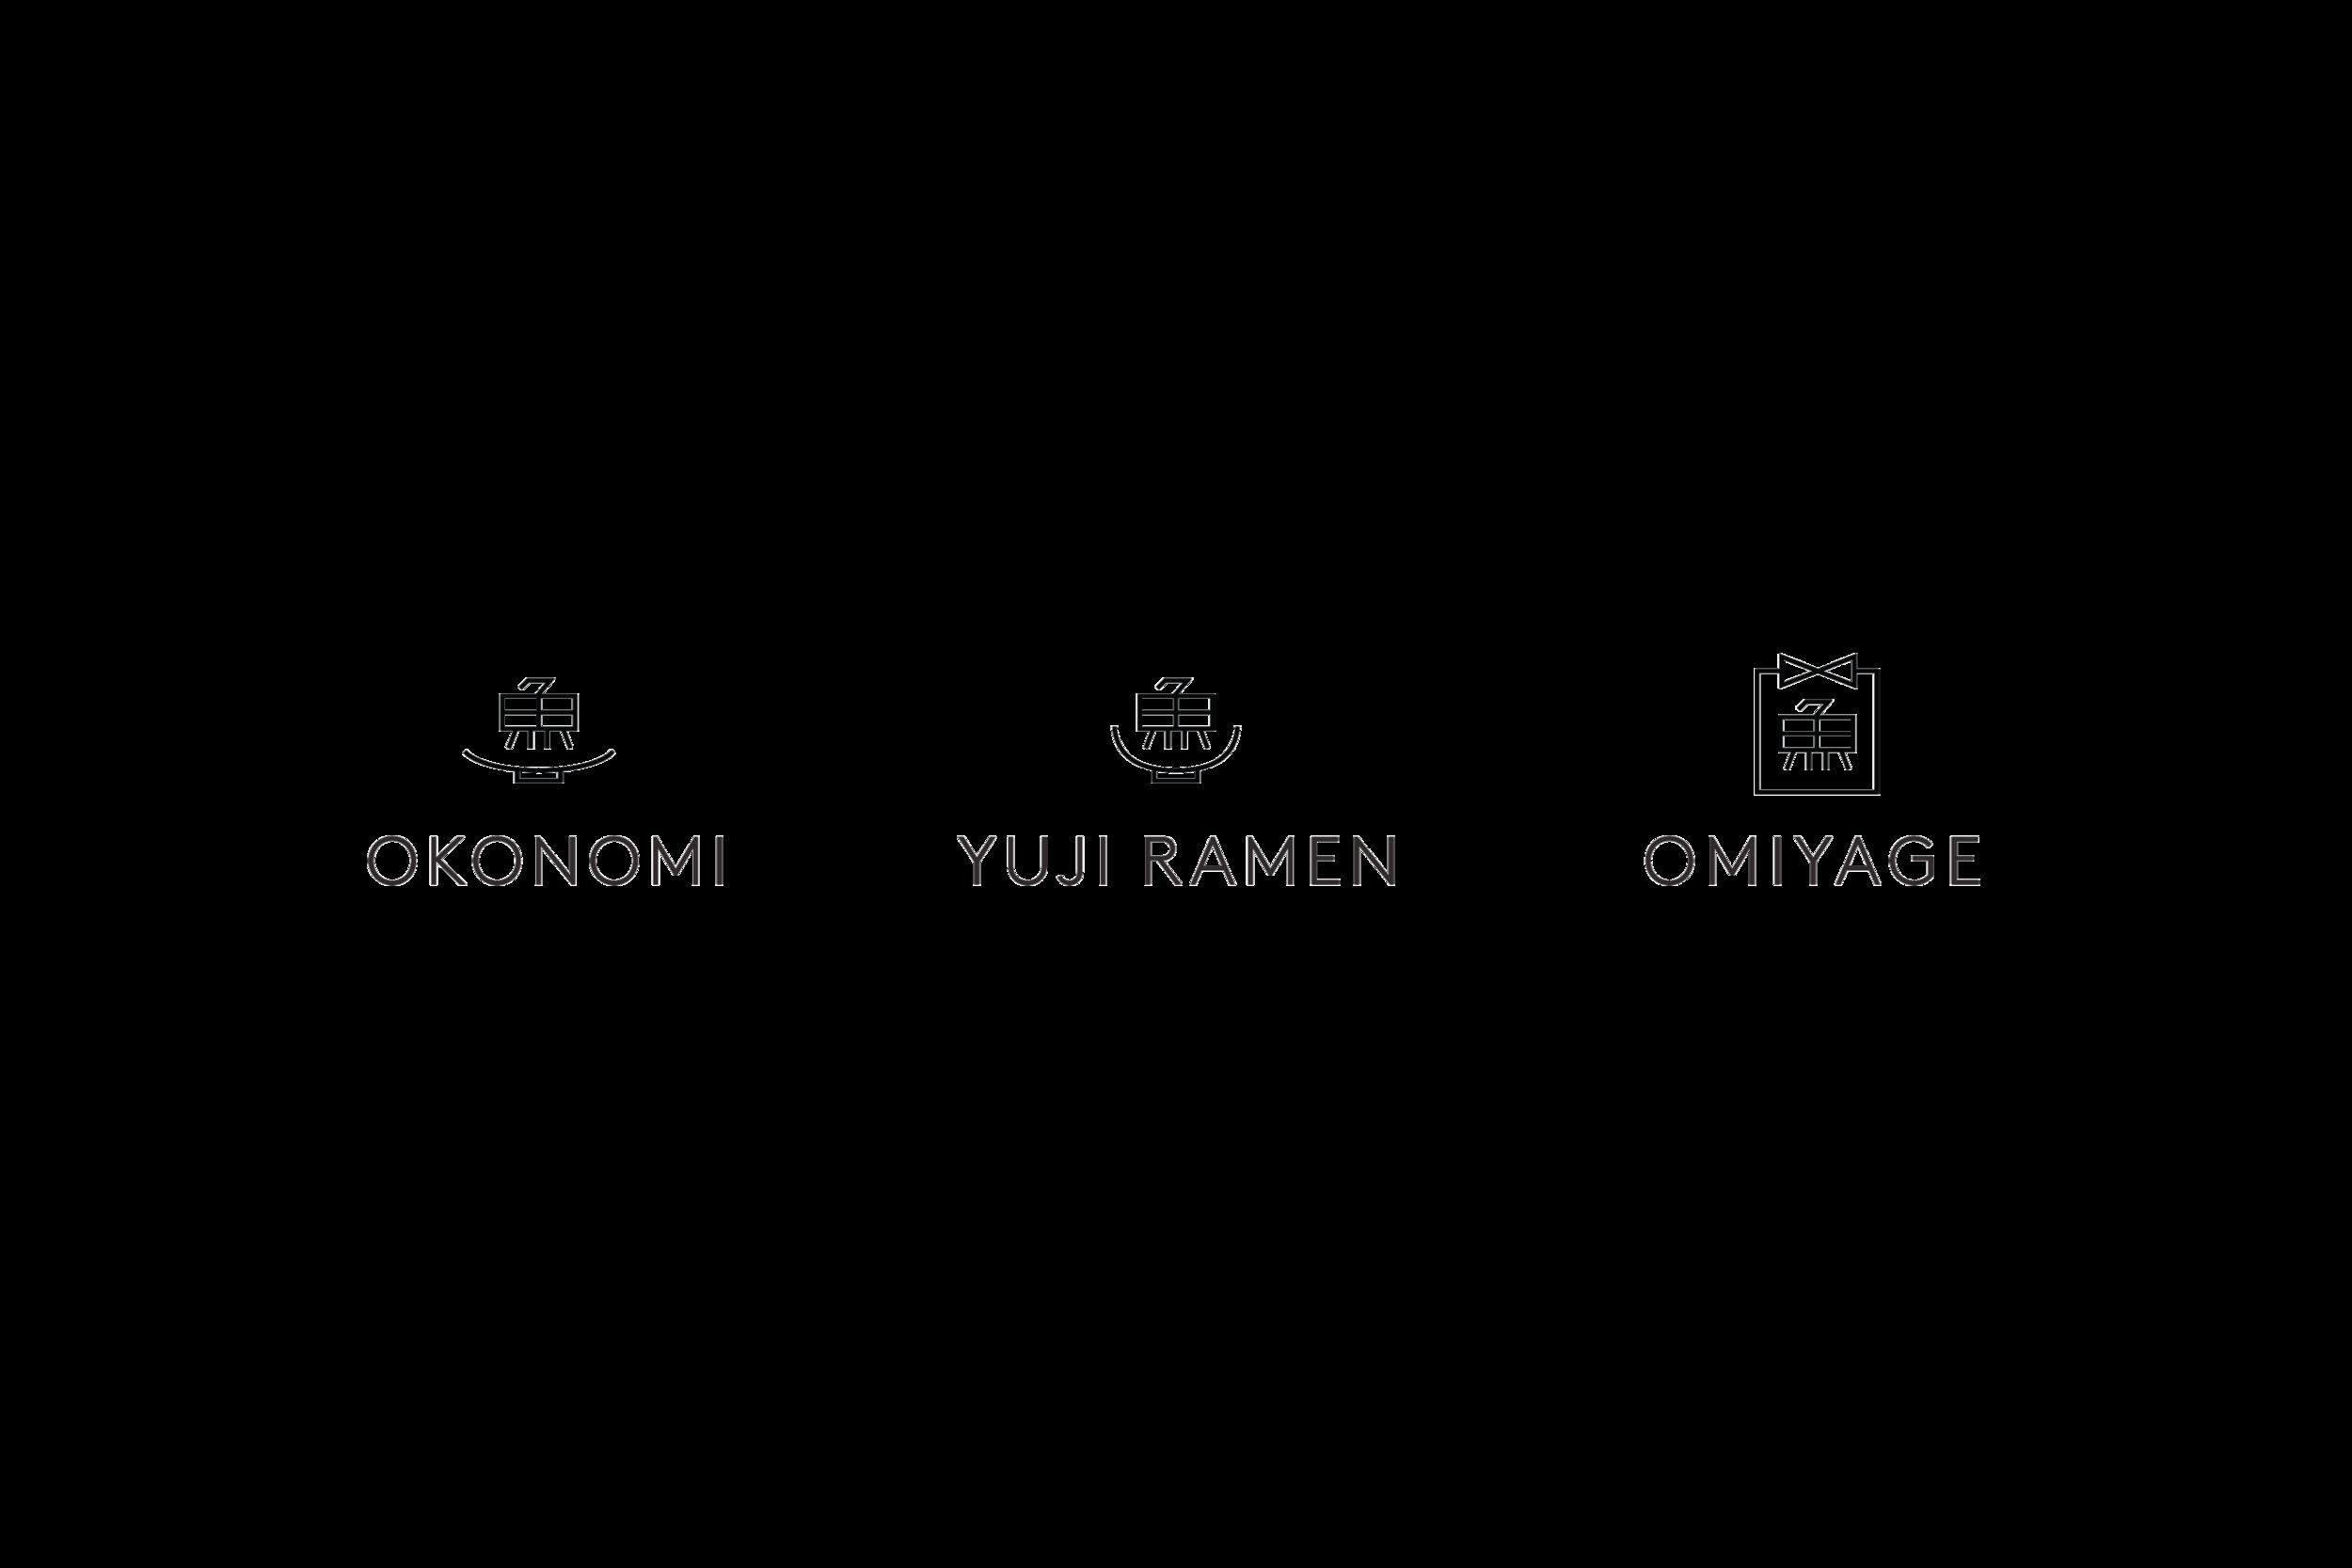 okonomi_logos.png